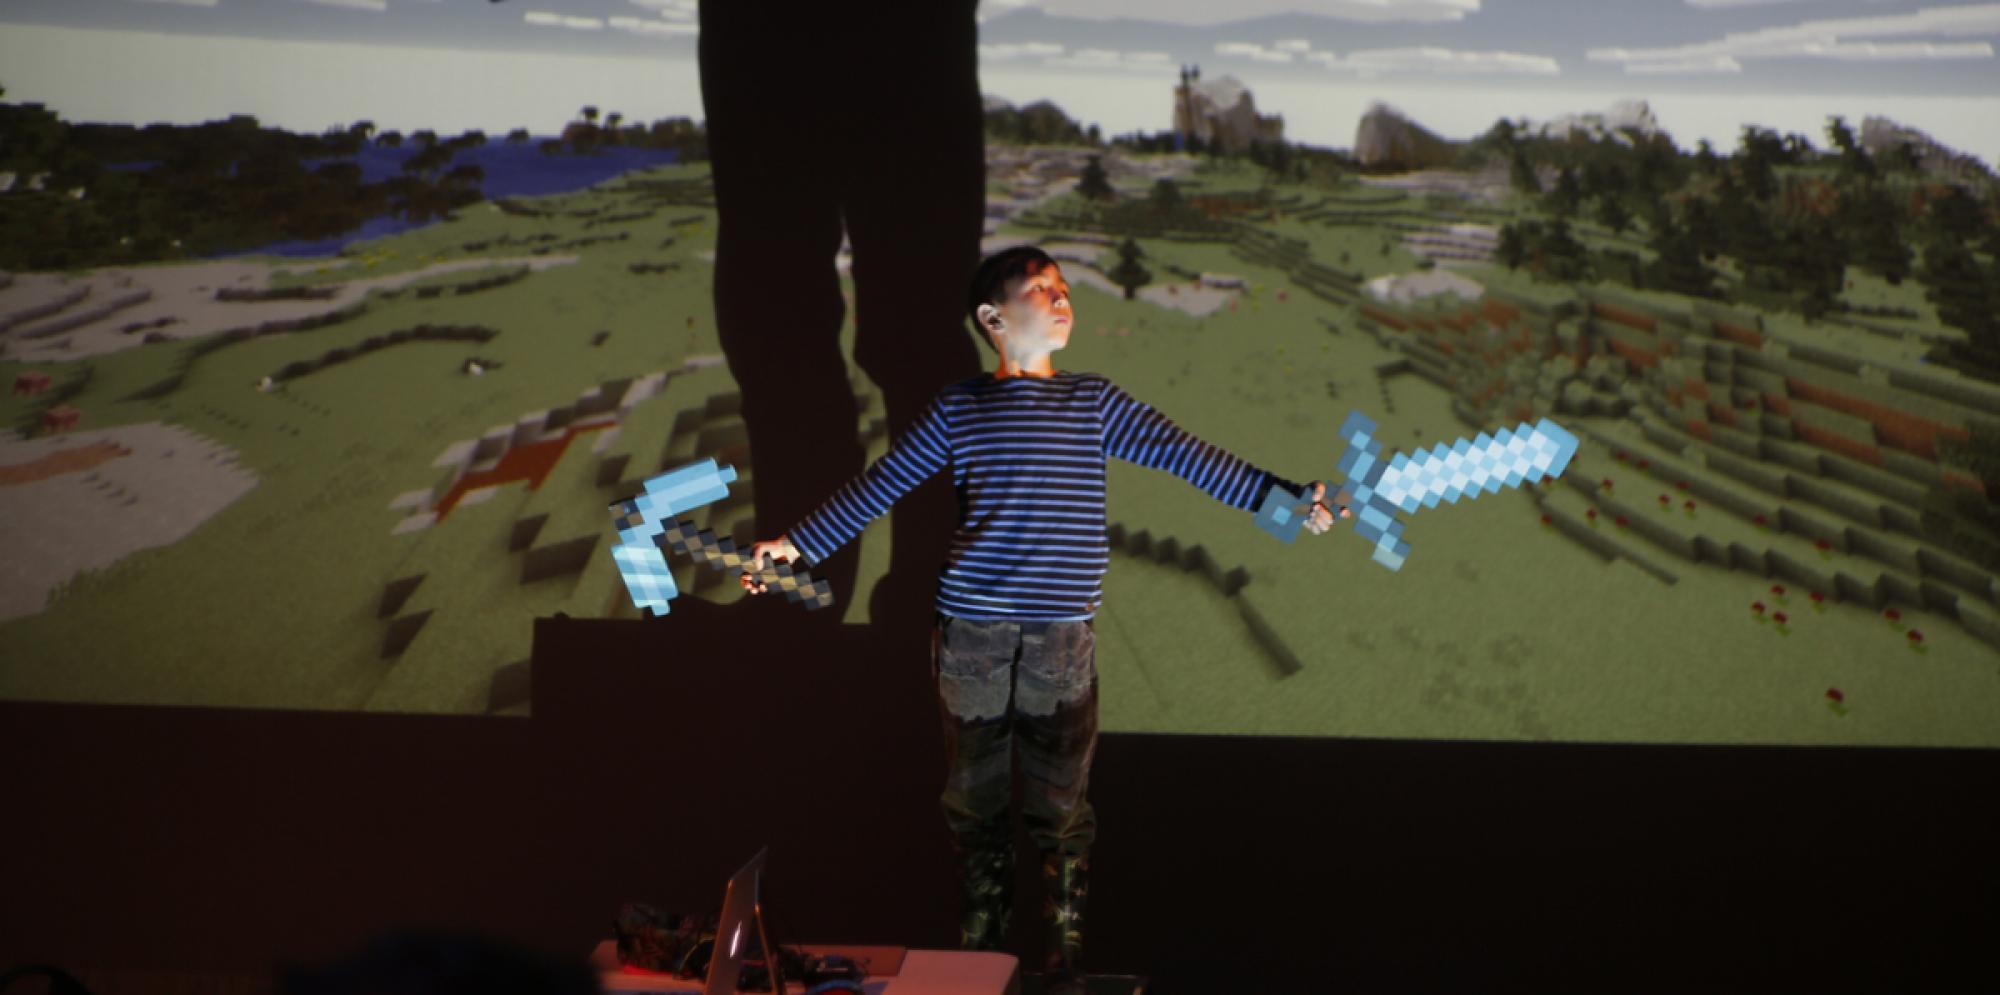 a boy holding up minecraft swords